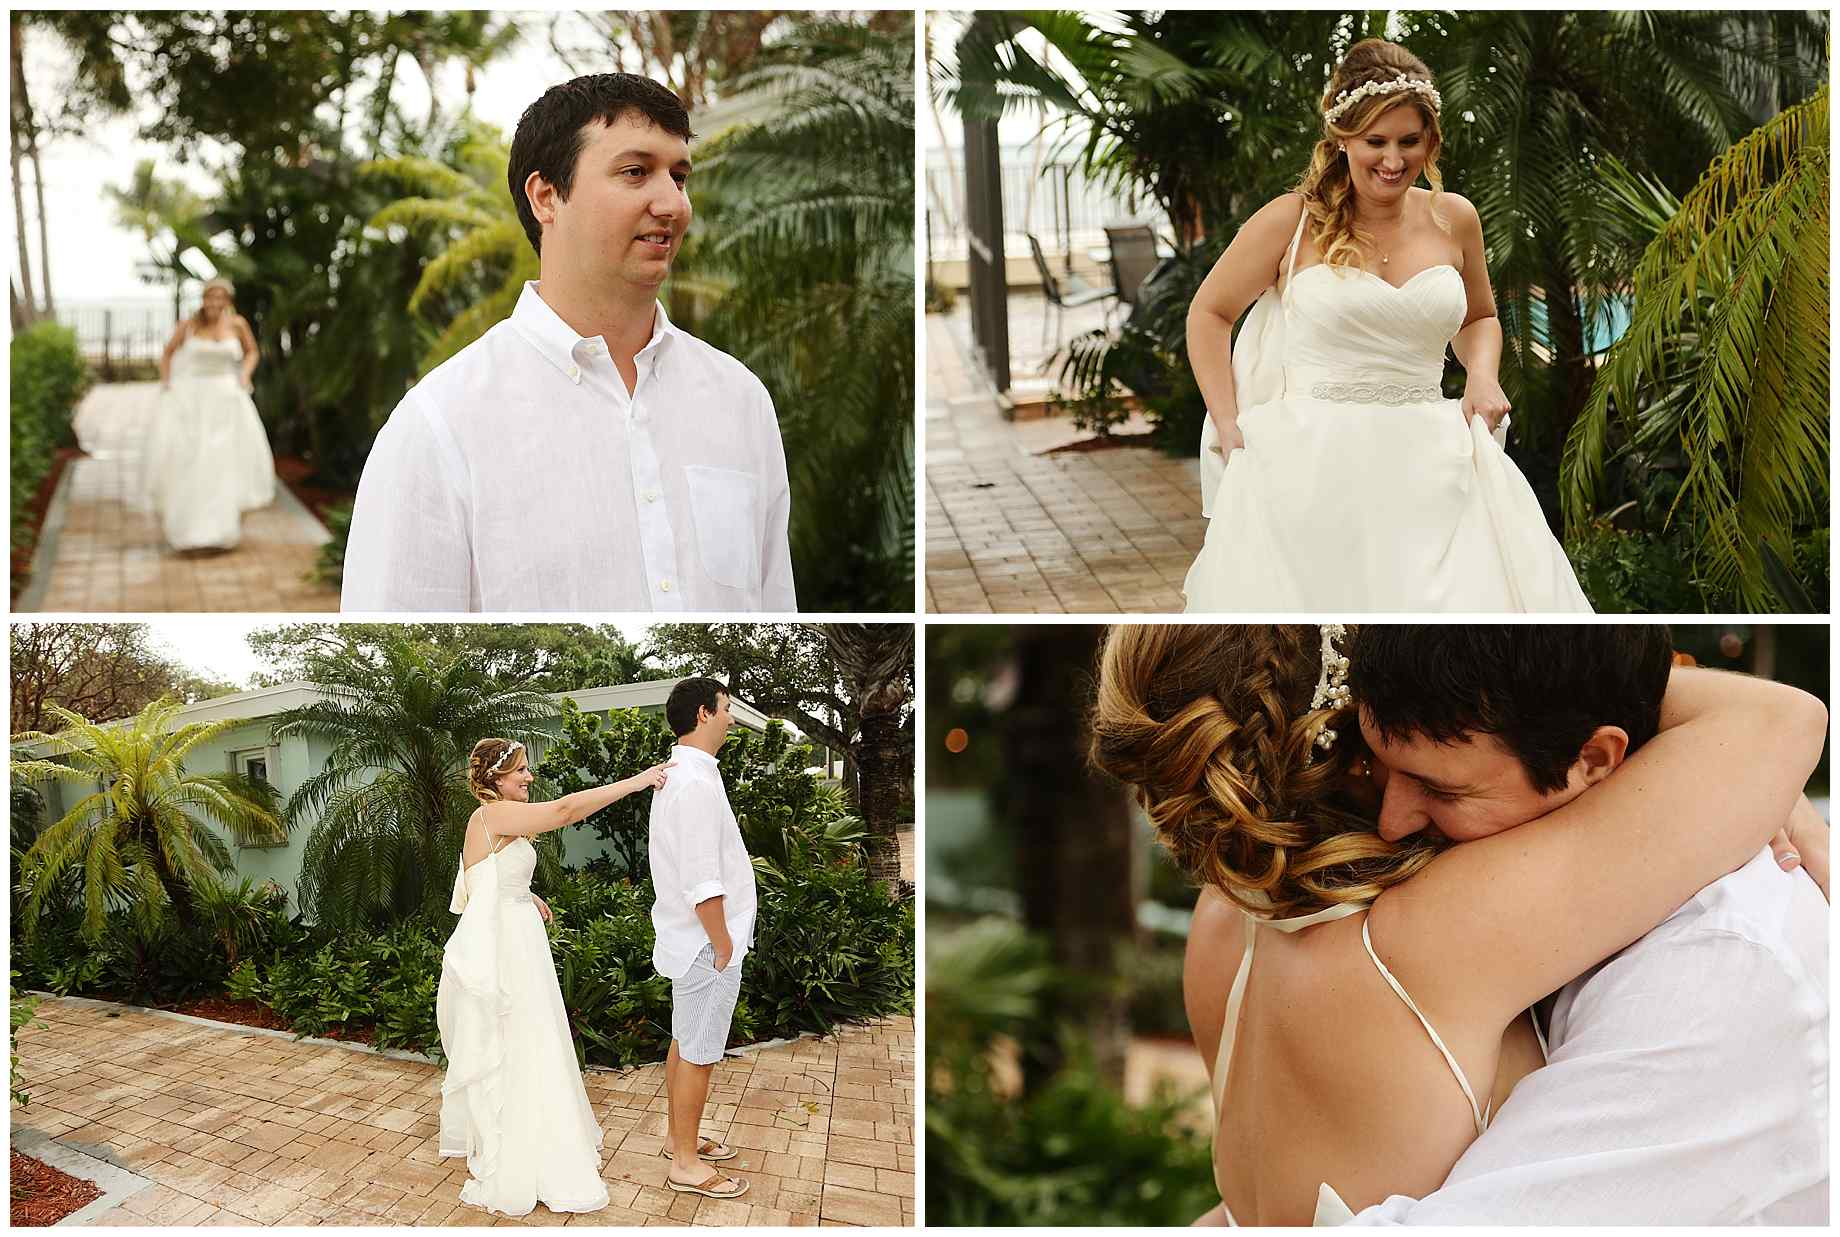 Key-Largo-Beach-Wedding-Photos-024